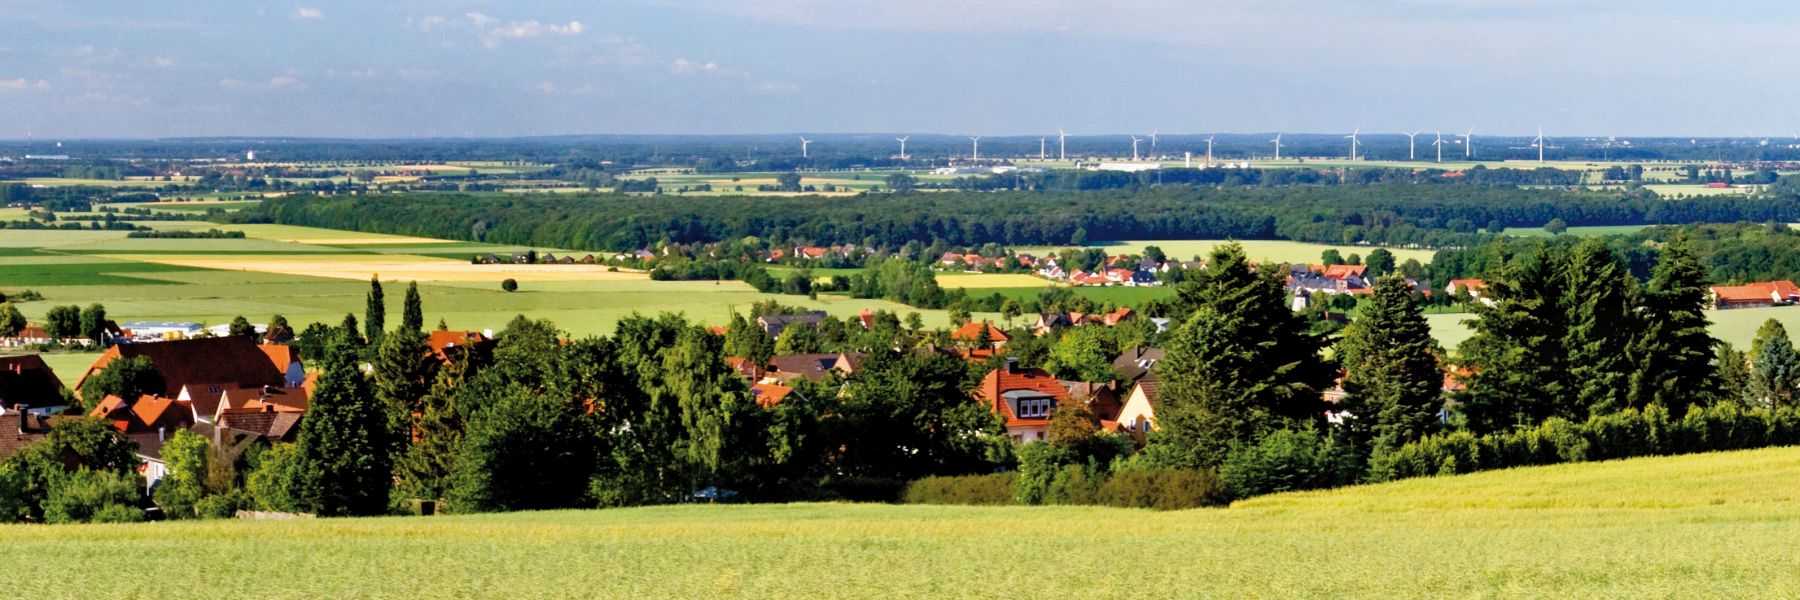 Baufirma Hannover haks in hannover hannover